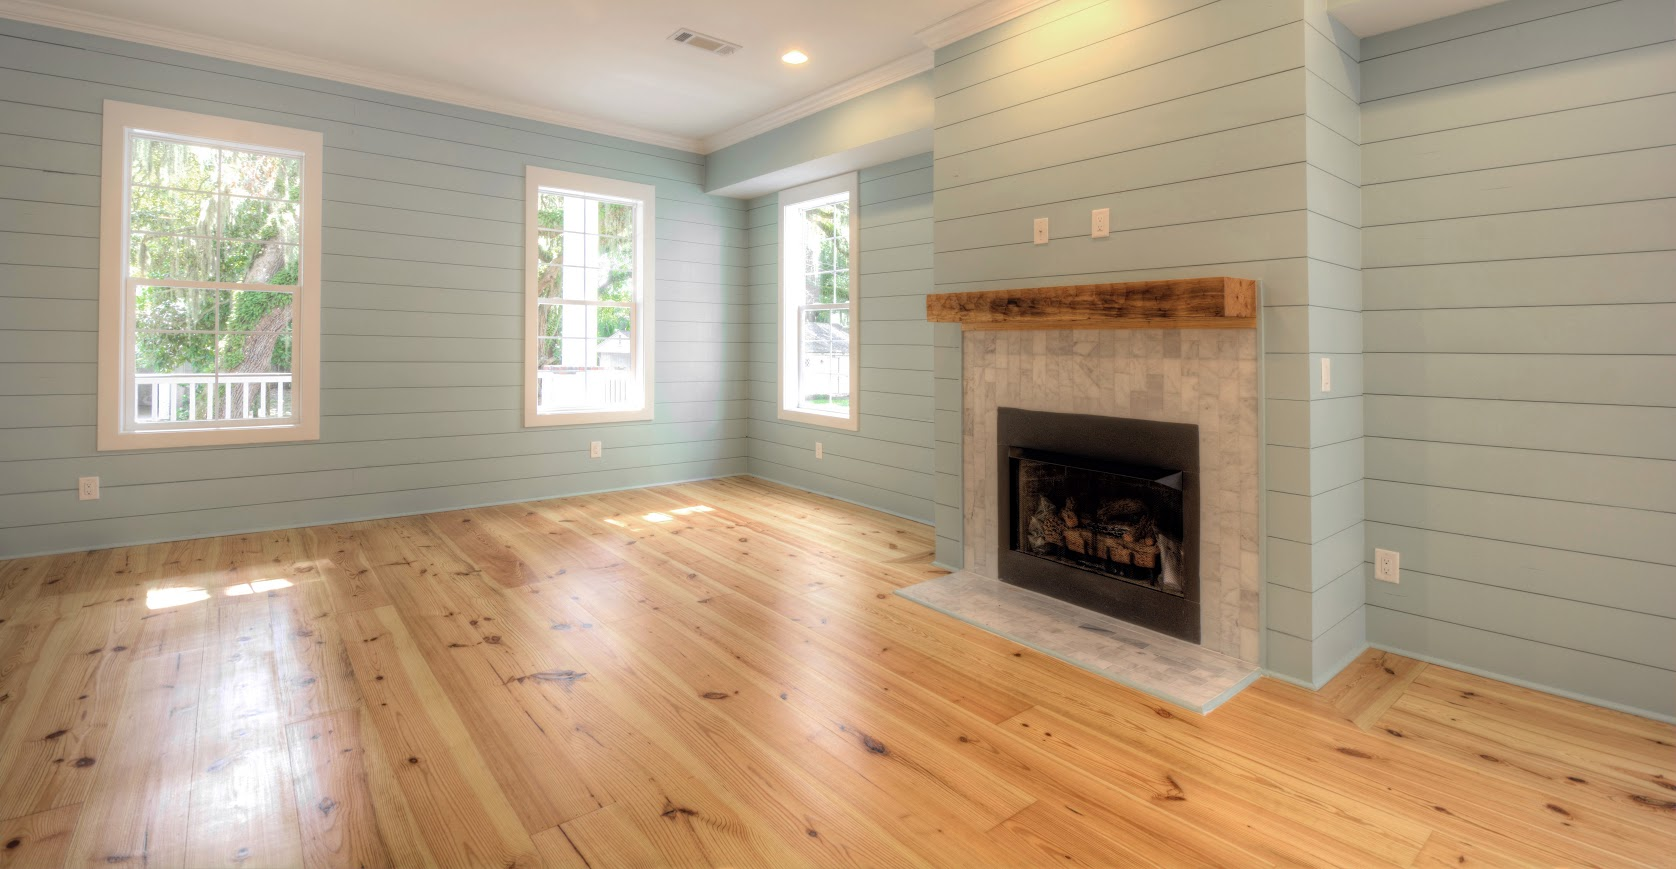 Wide Plank New Heart Pine Flooring